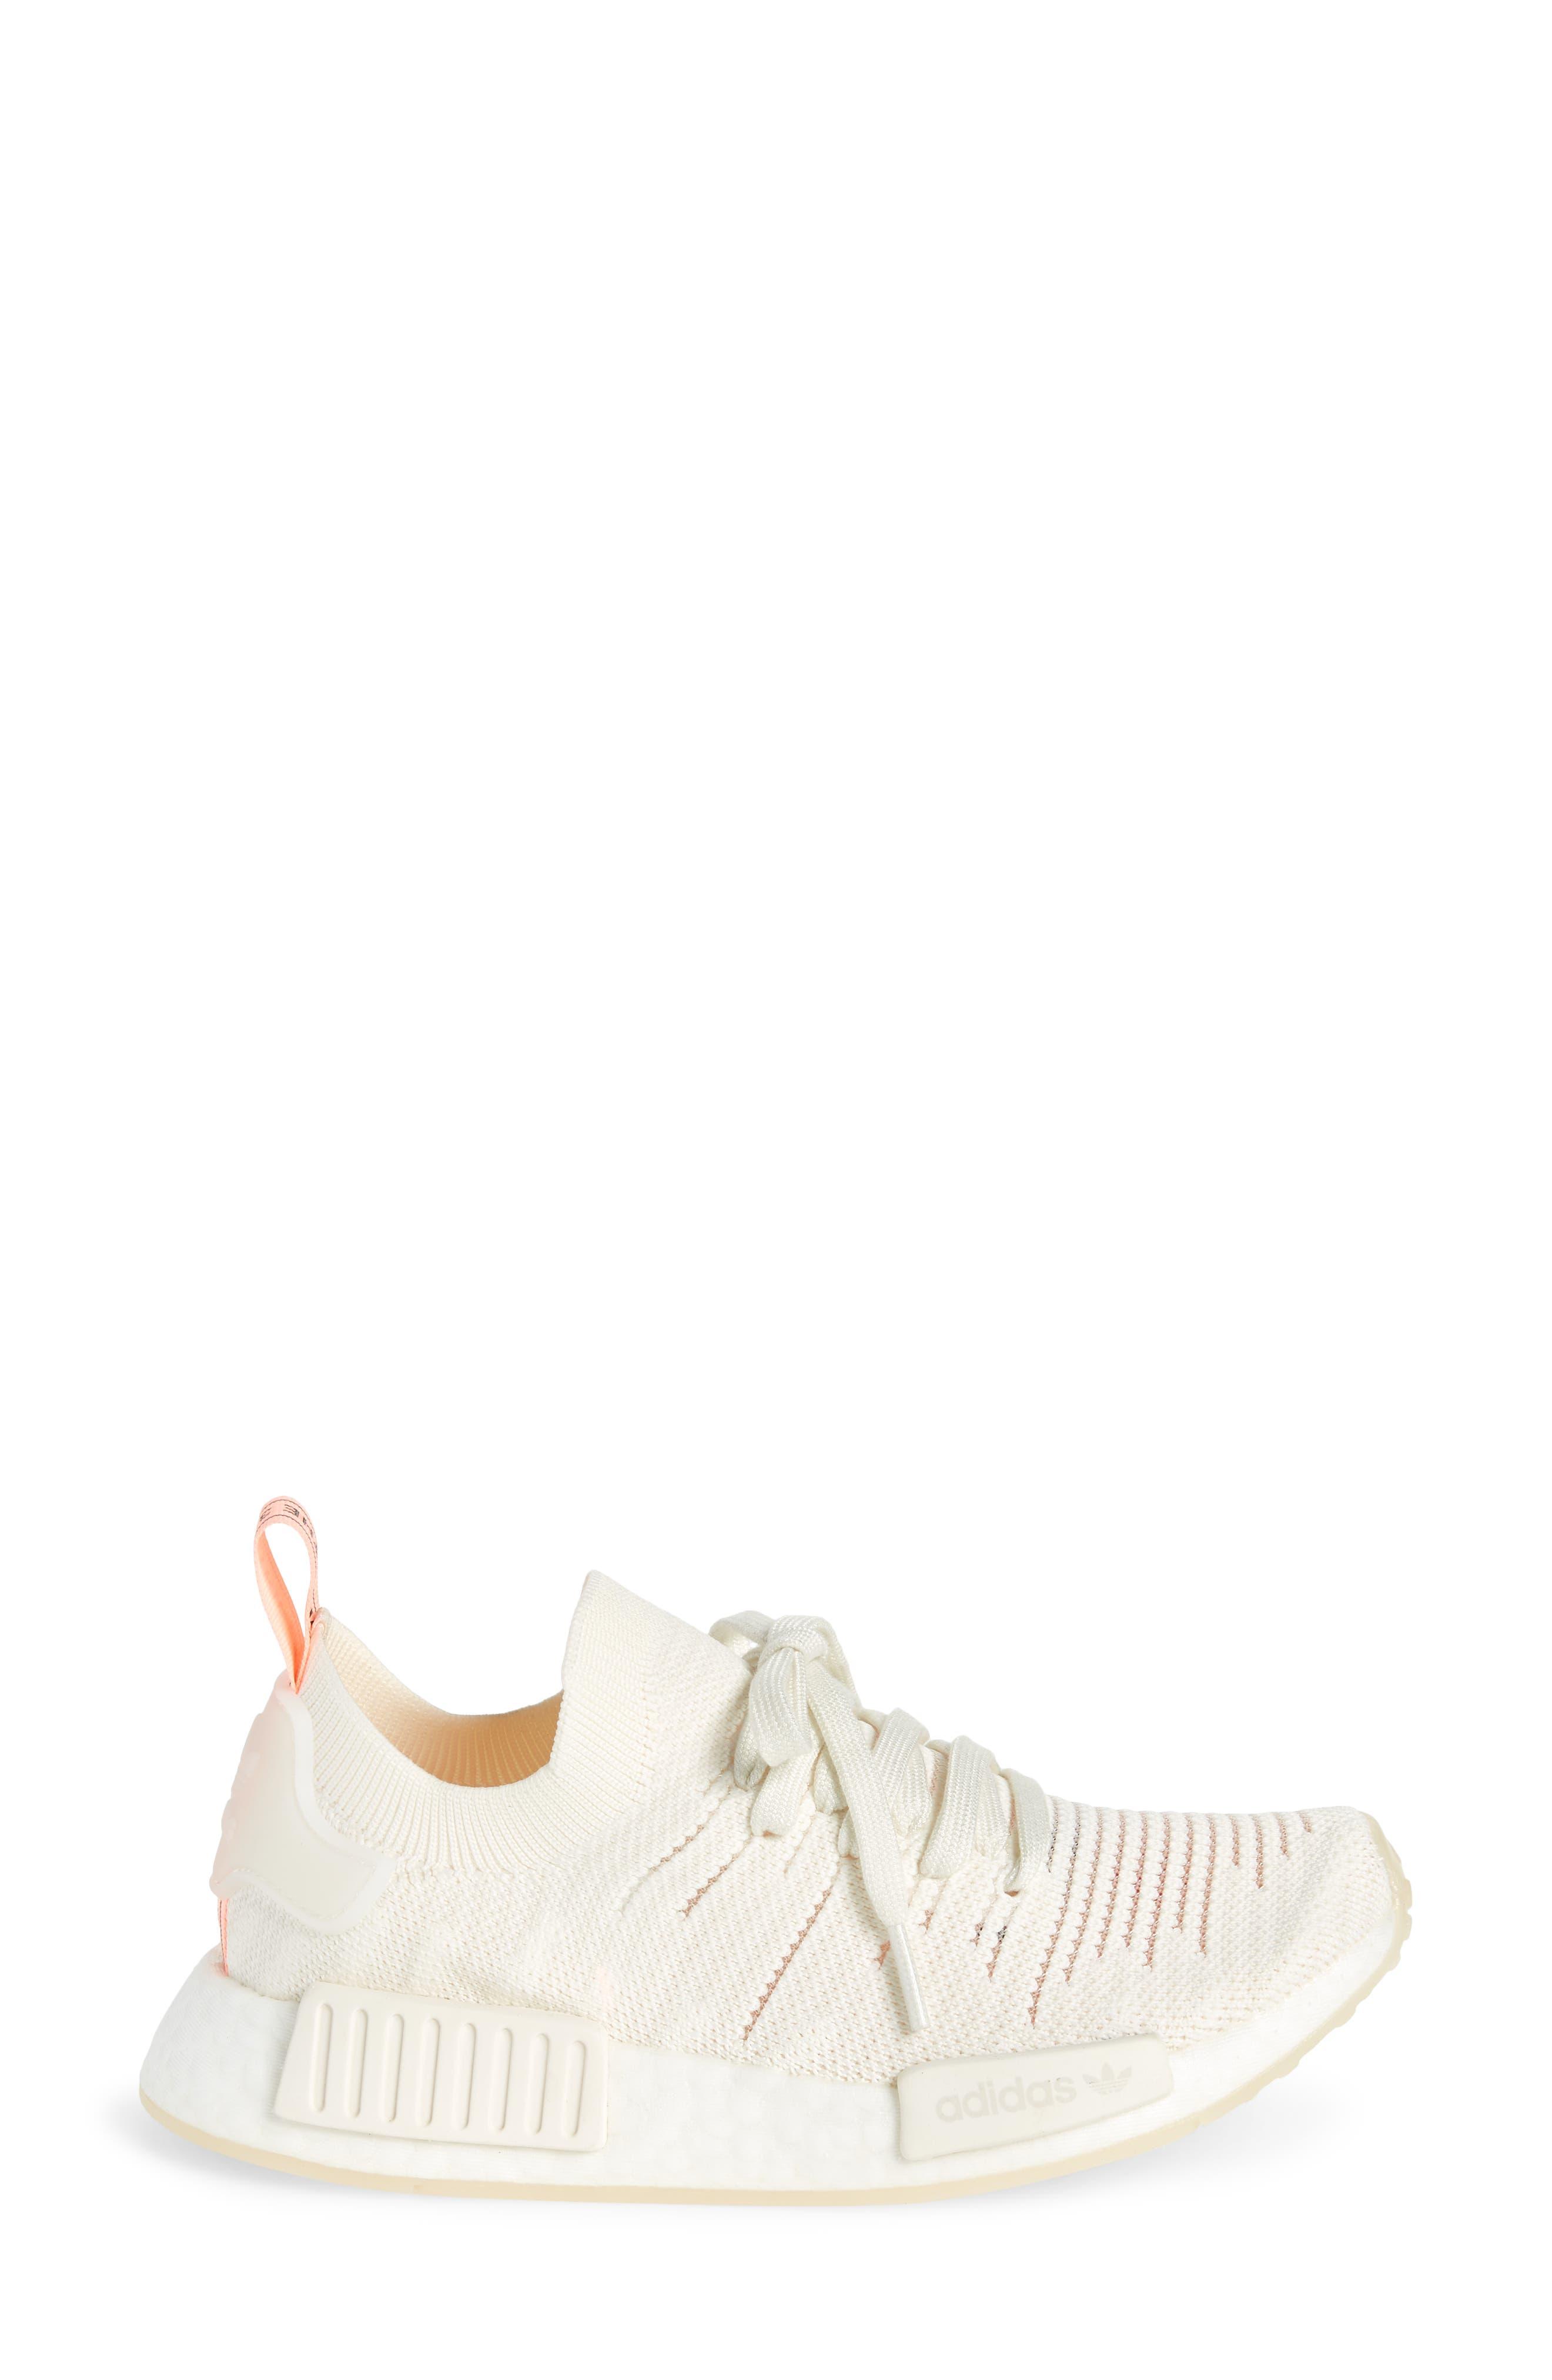 NMD R1 STLT Primeknit Sneaker,                             Alternate thumbnail 3, color,                             100